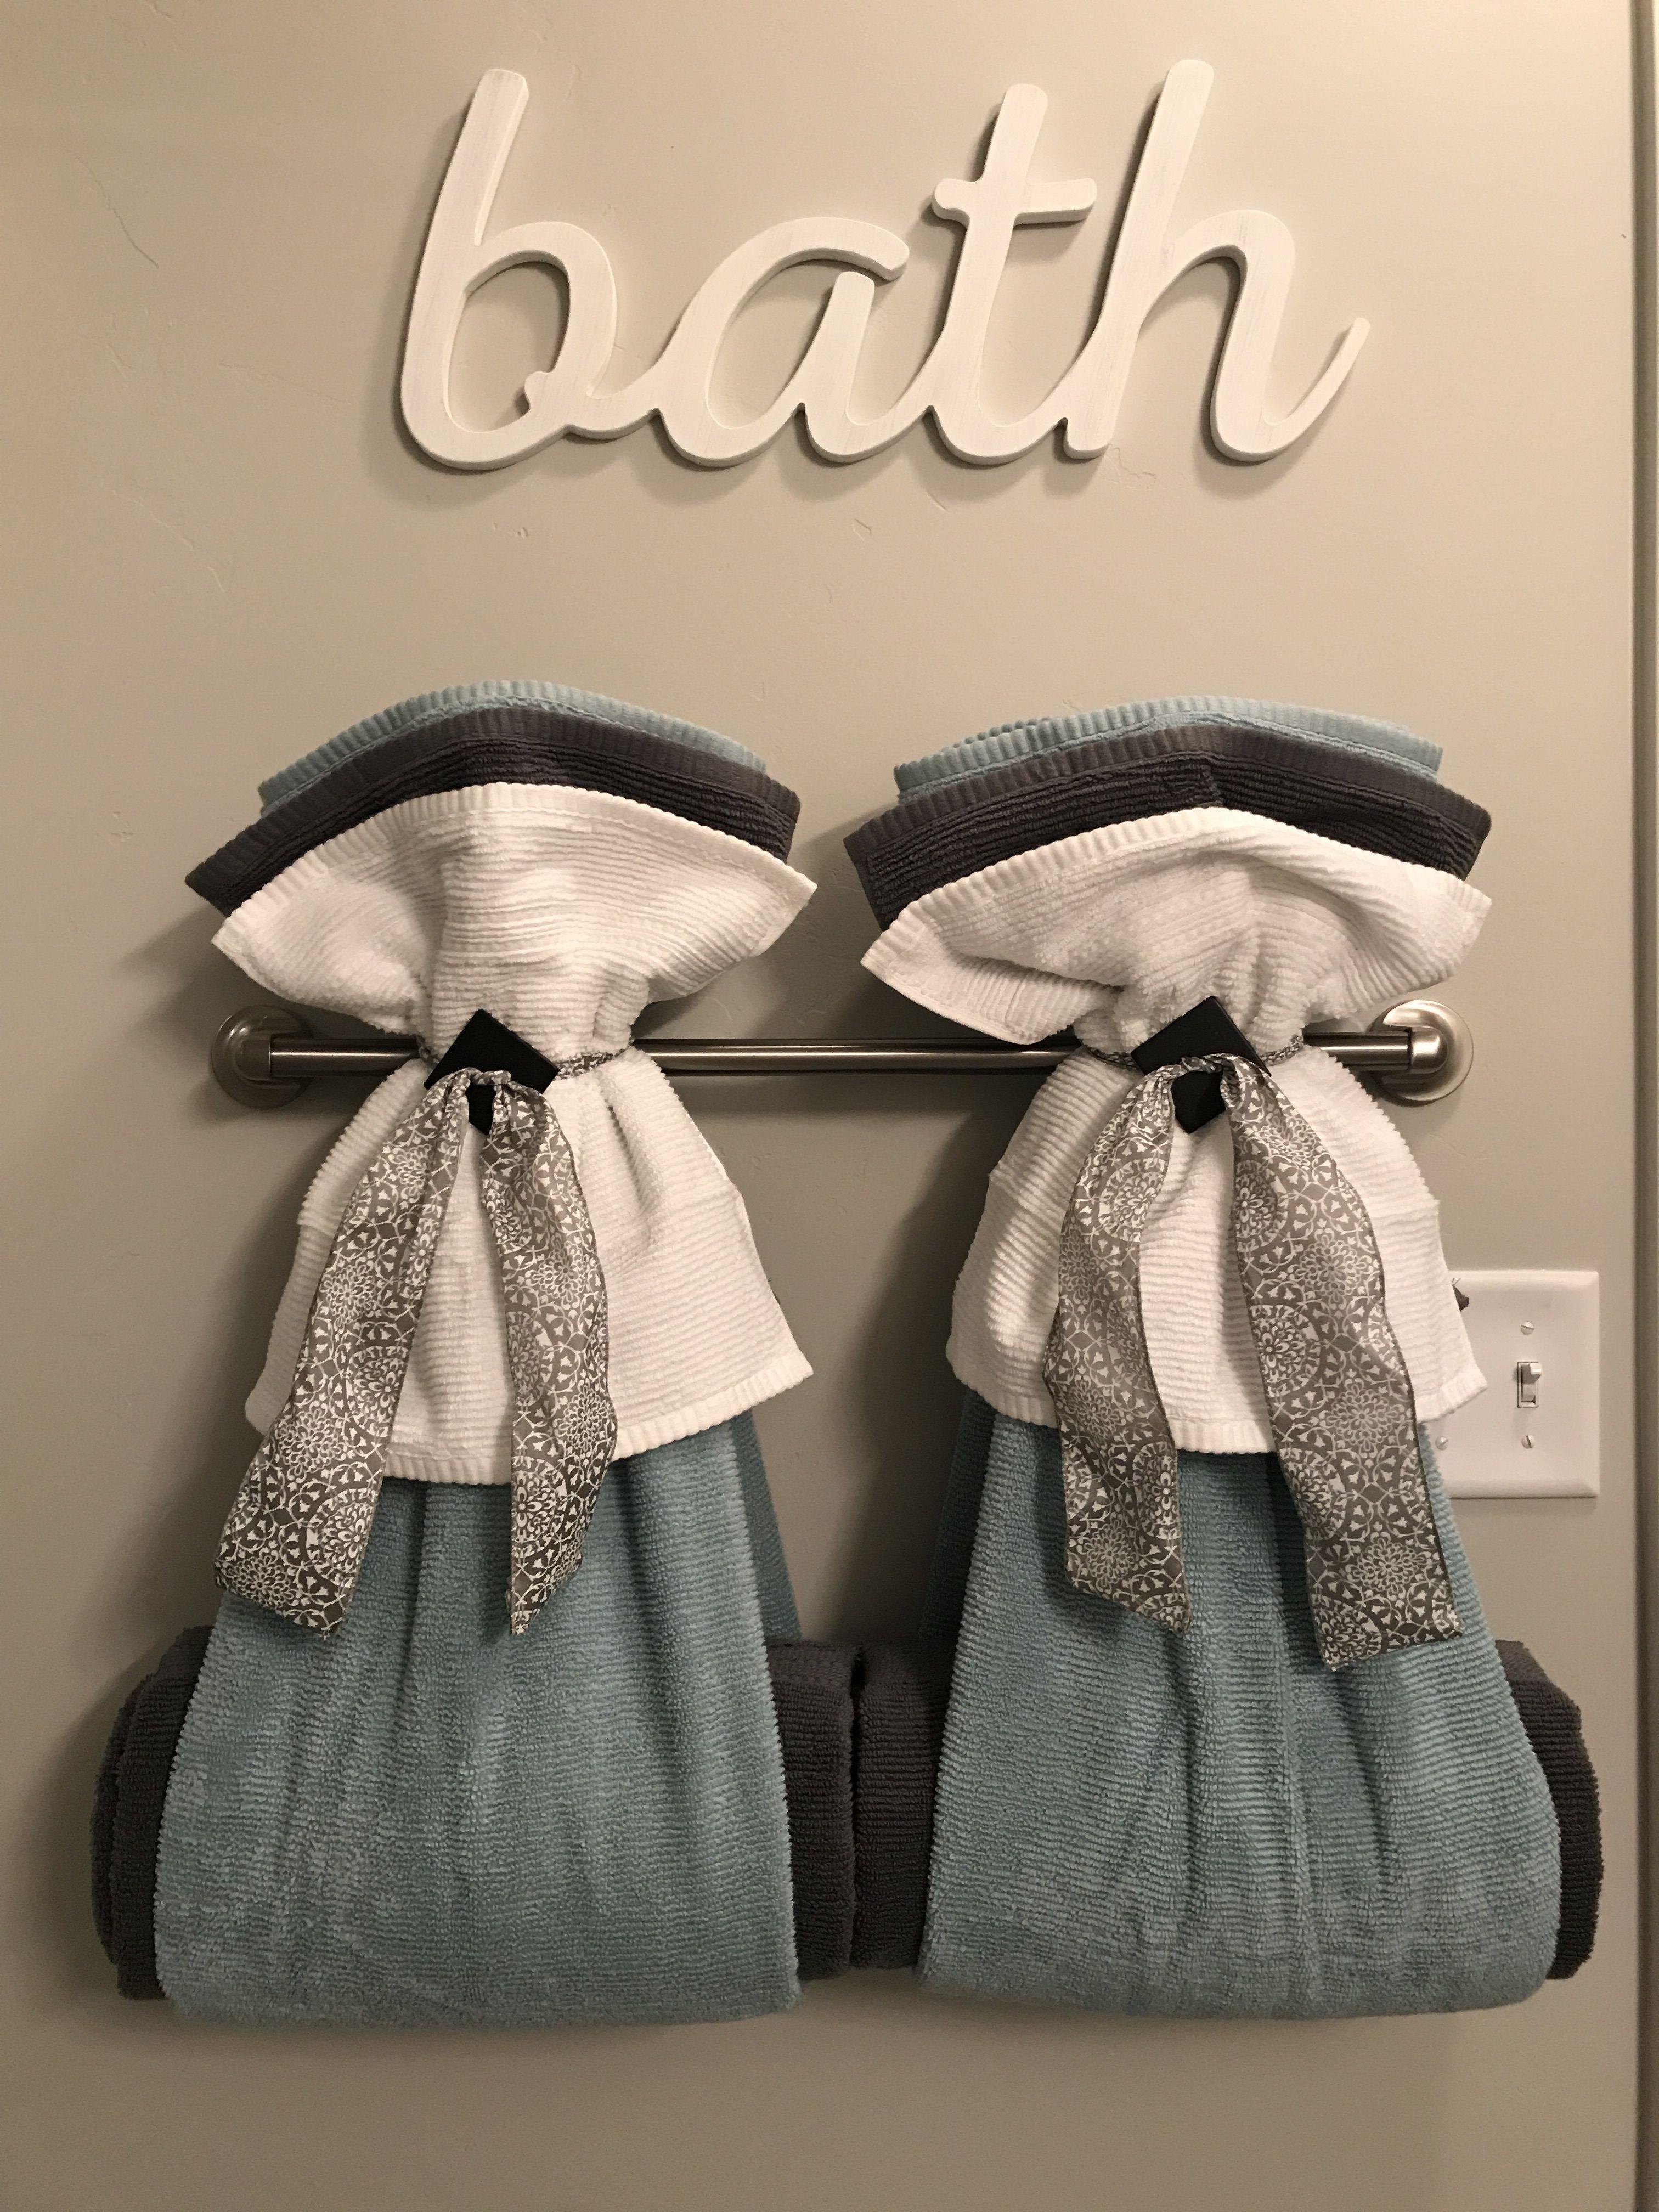 Bathroom Towel Display Towel Rack Bathroom Hanging Bathroom Towels Display Towel Display